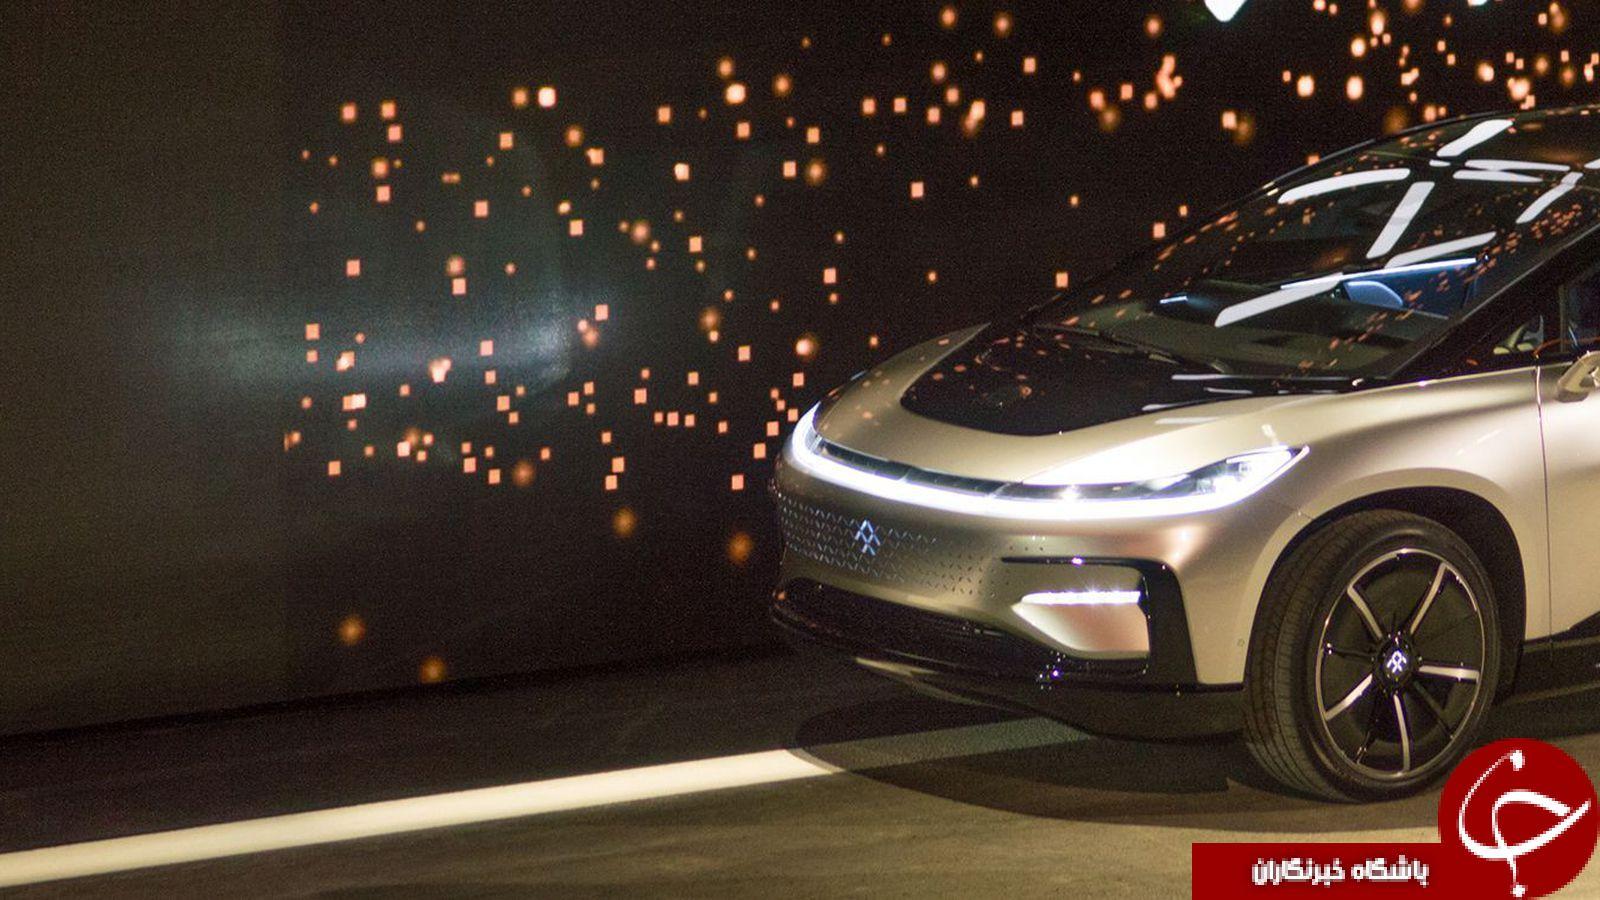 پرسرعت ترين خودروي الکتريکي جهان رونمايي شد+تصاوير